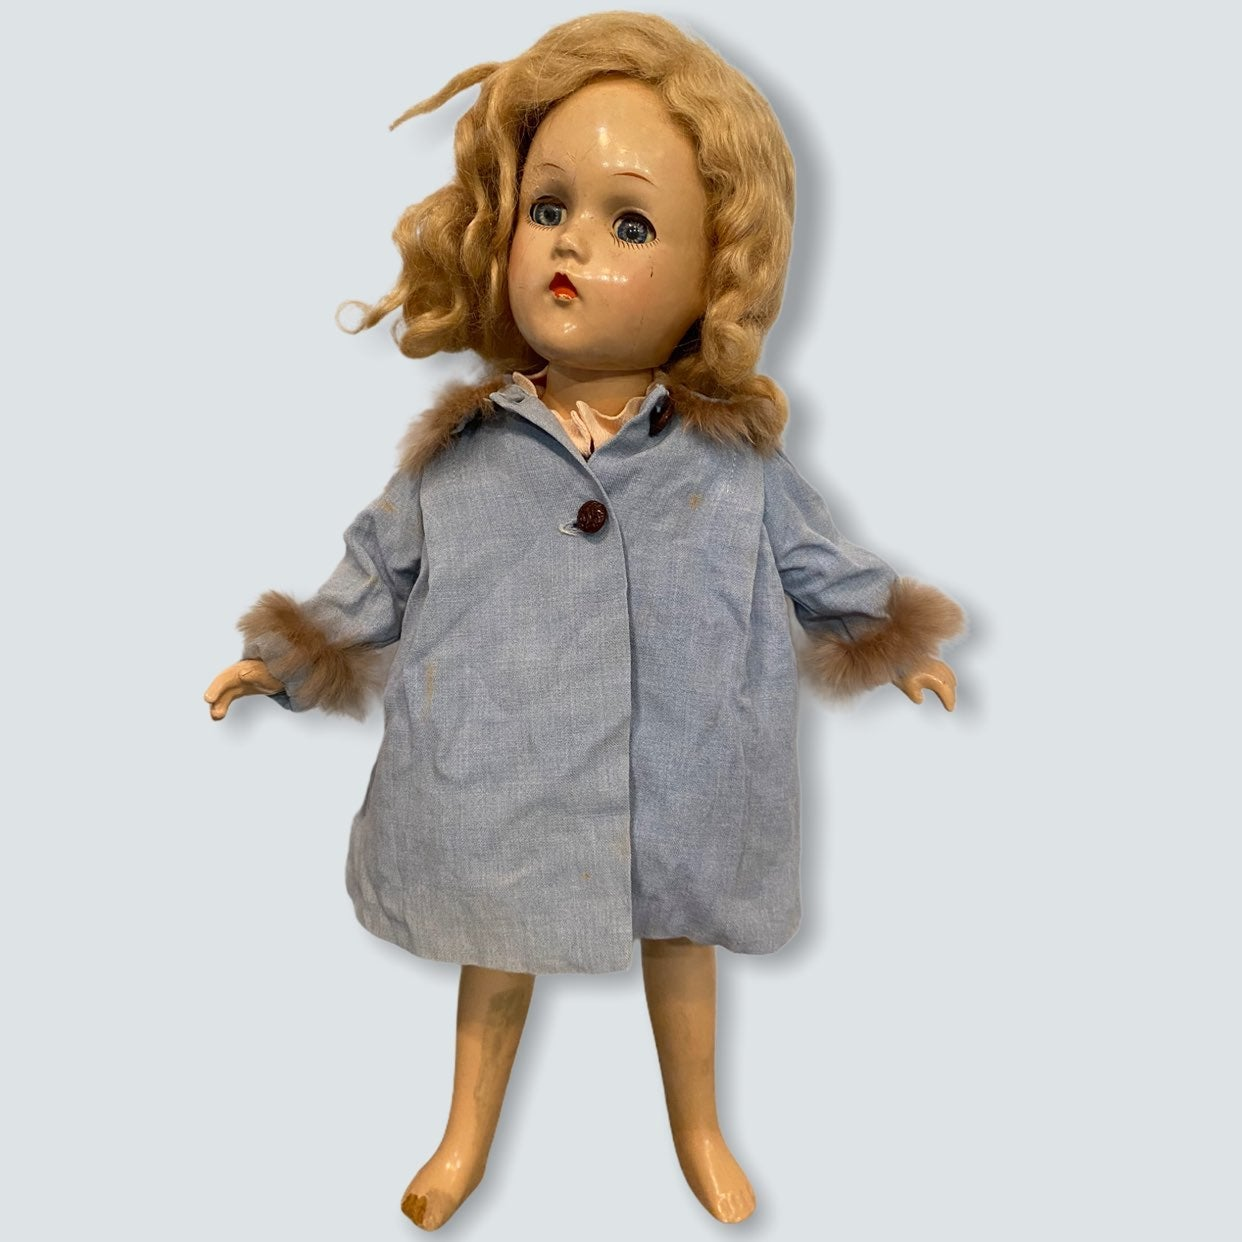 Vintage Compo Madame Alexander Doll